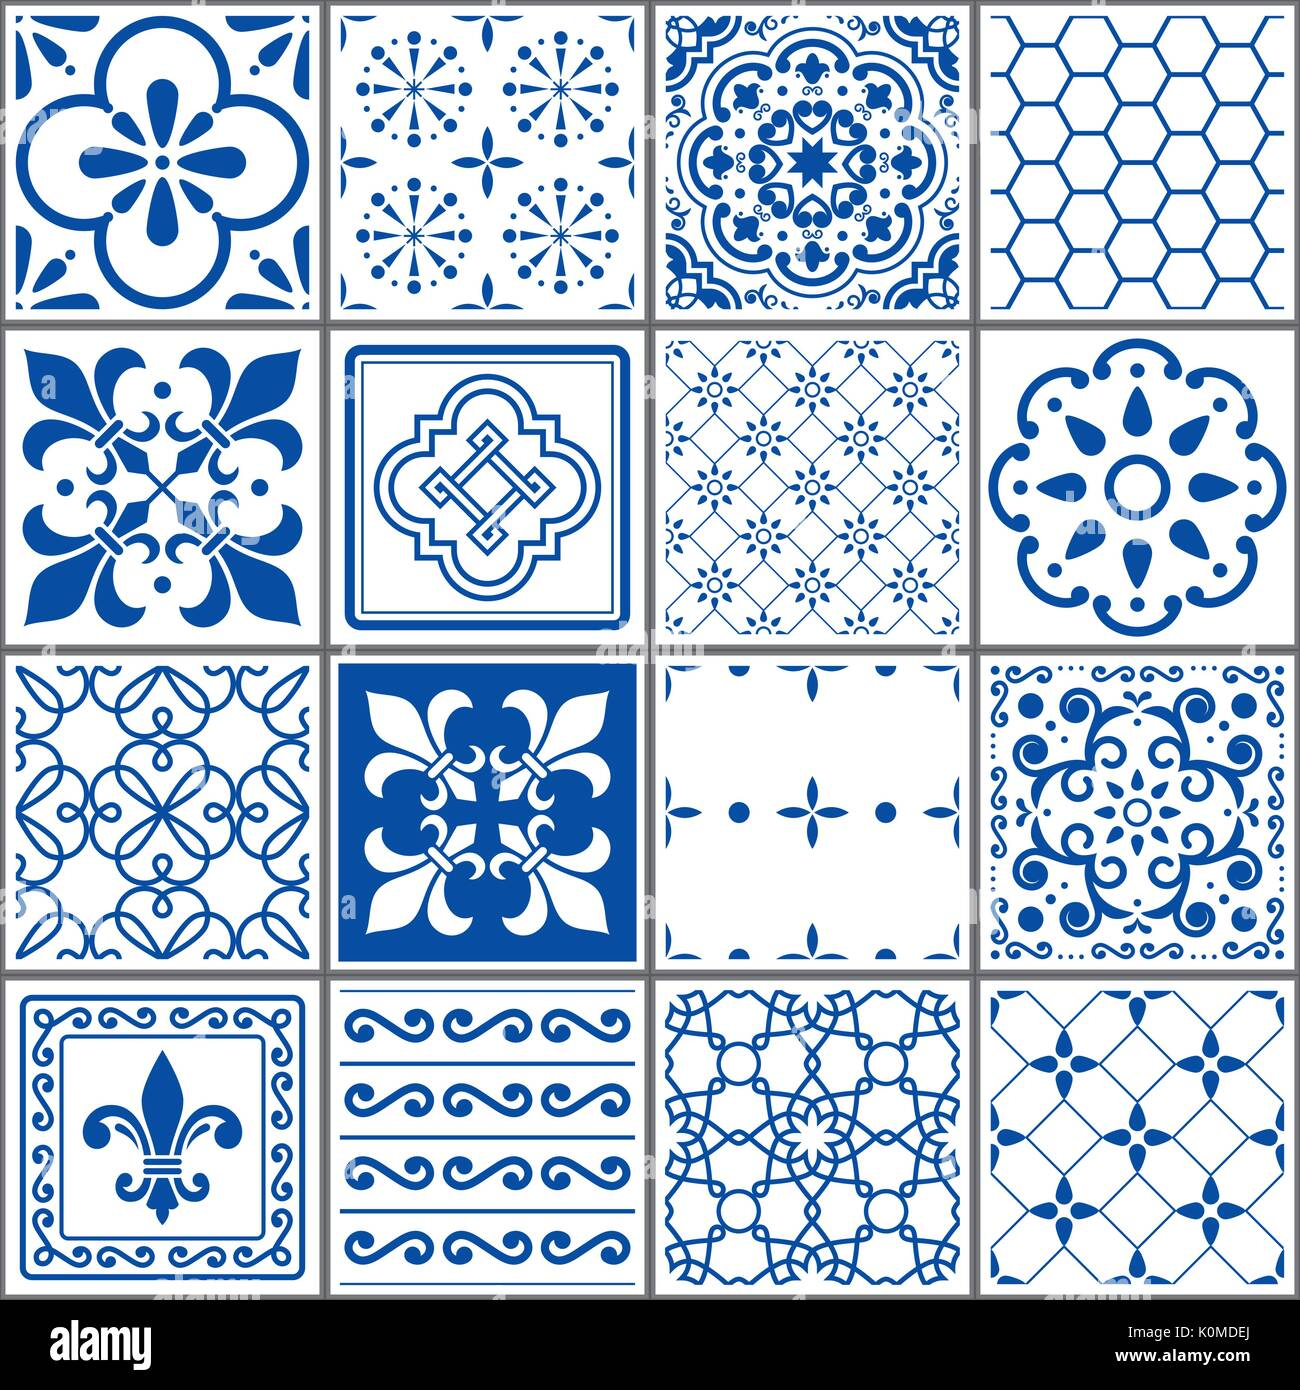 Portuguese tiles pattern, Lisbon seamless indigo blue tiles, Azulejos vintage geometric ceramic design - Stock Vector